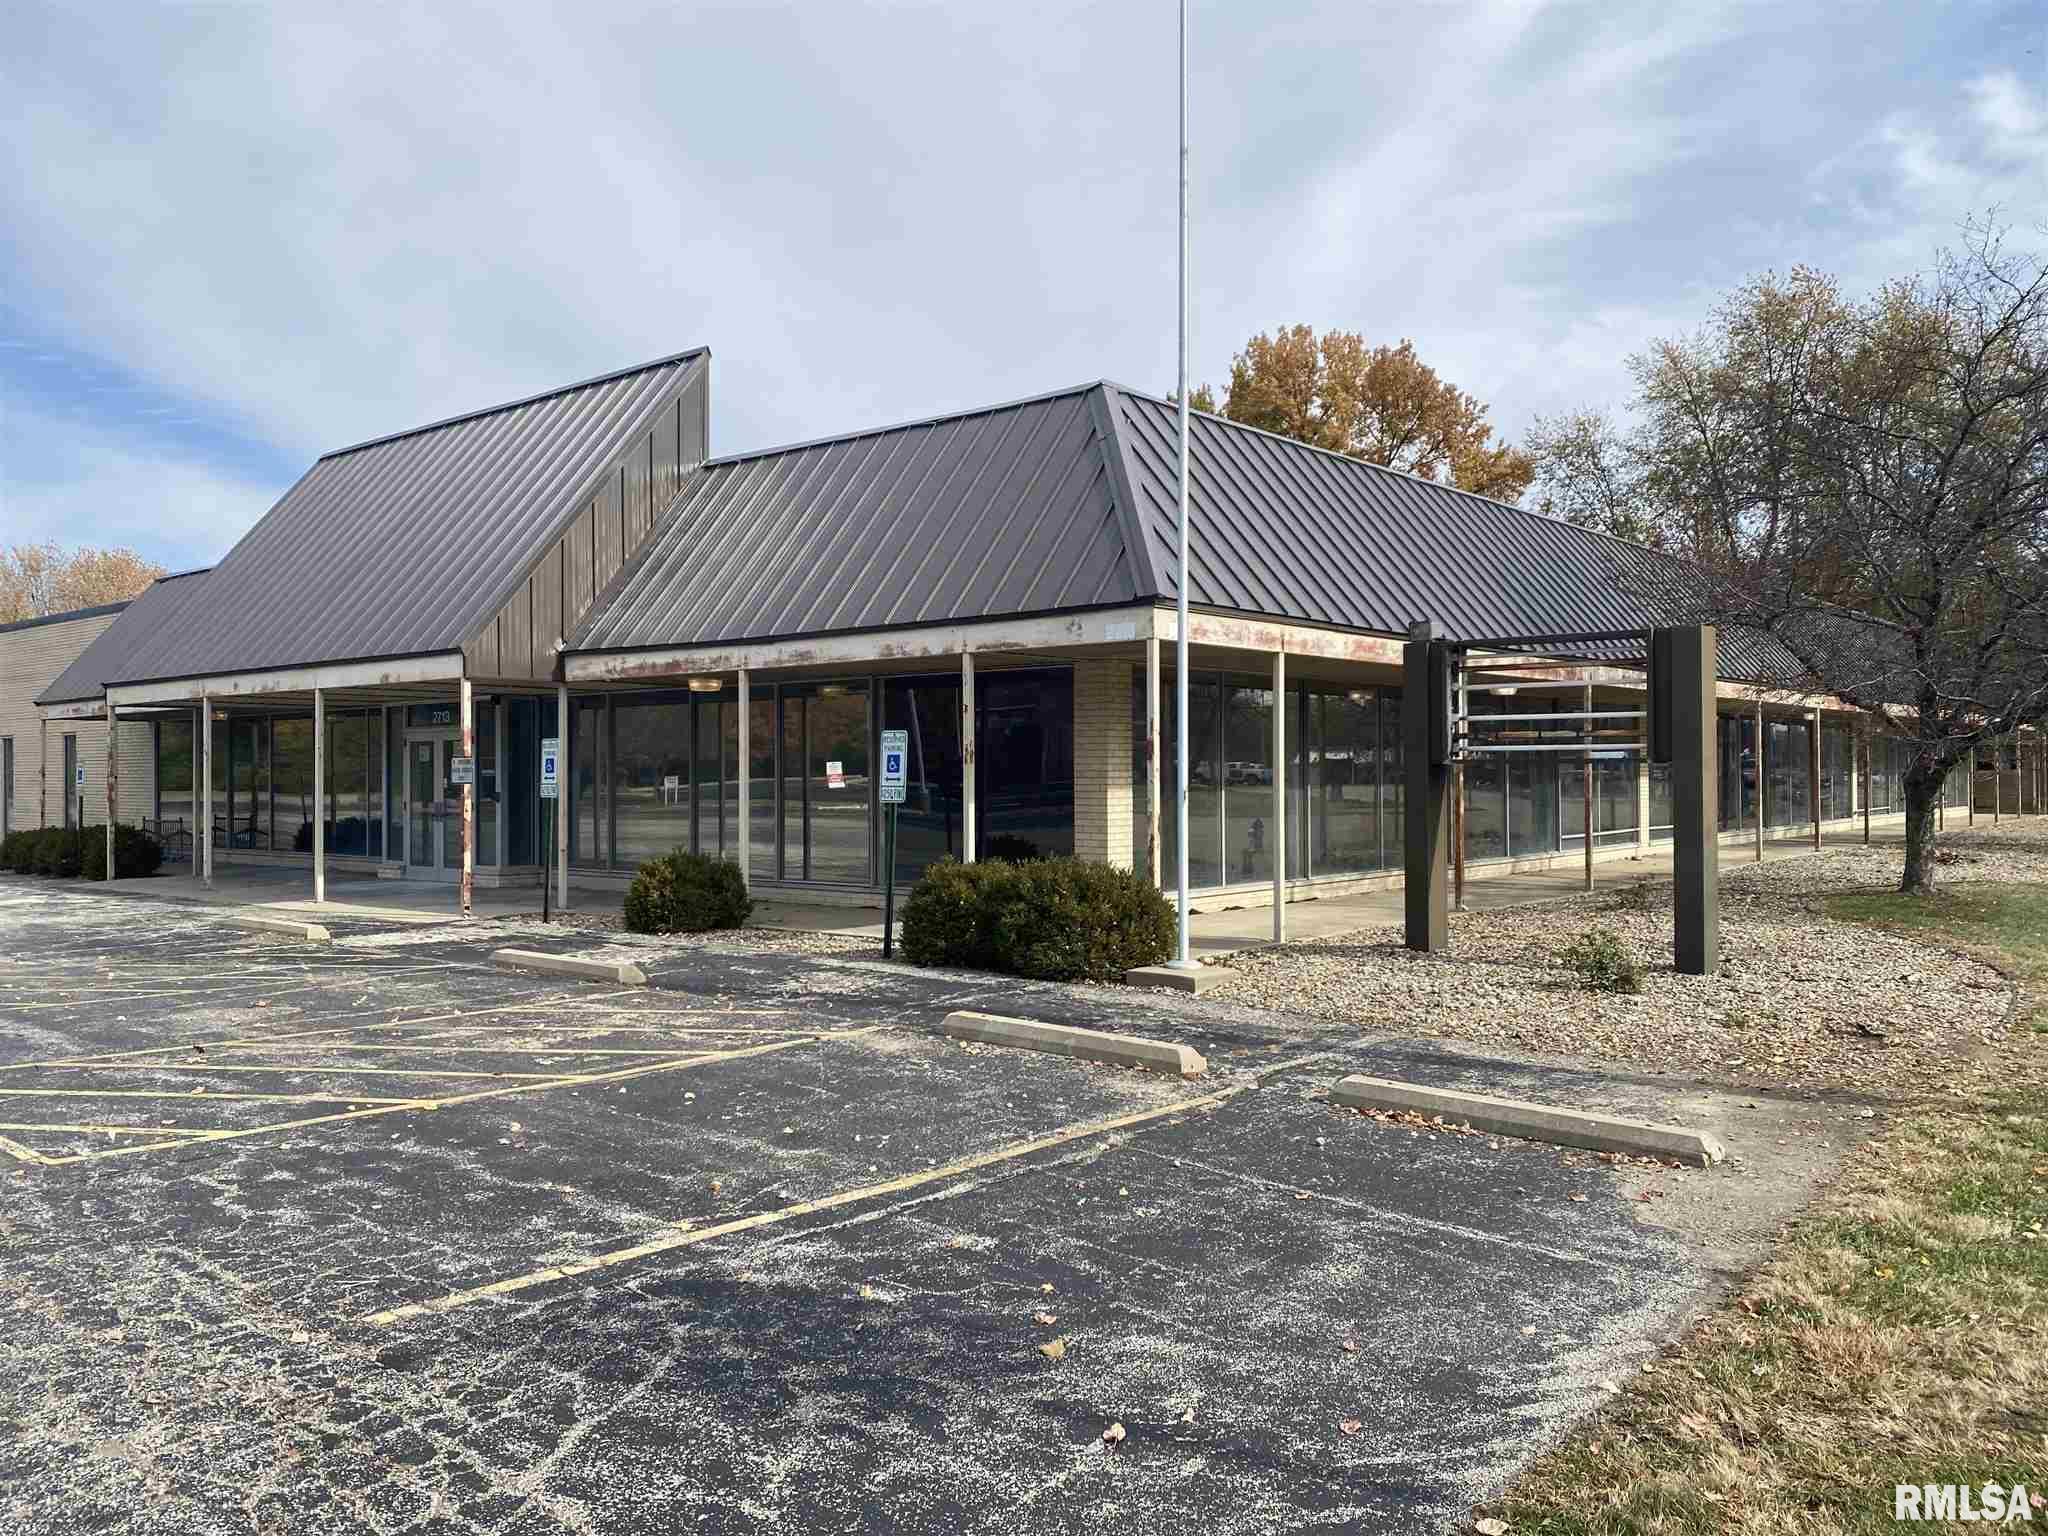 2713 Adlai Stevenson Property Photo - Springfield, IL real estate listing